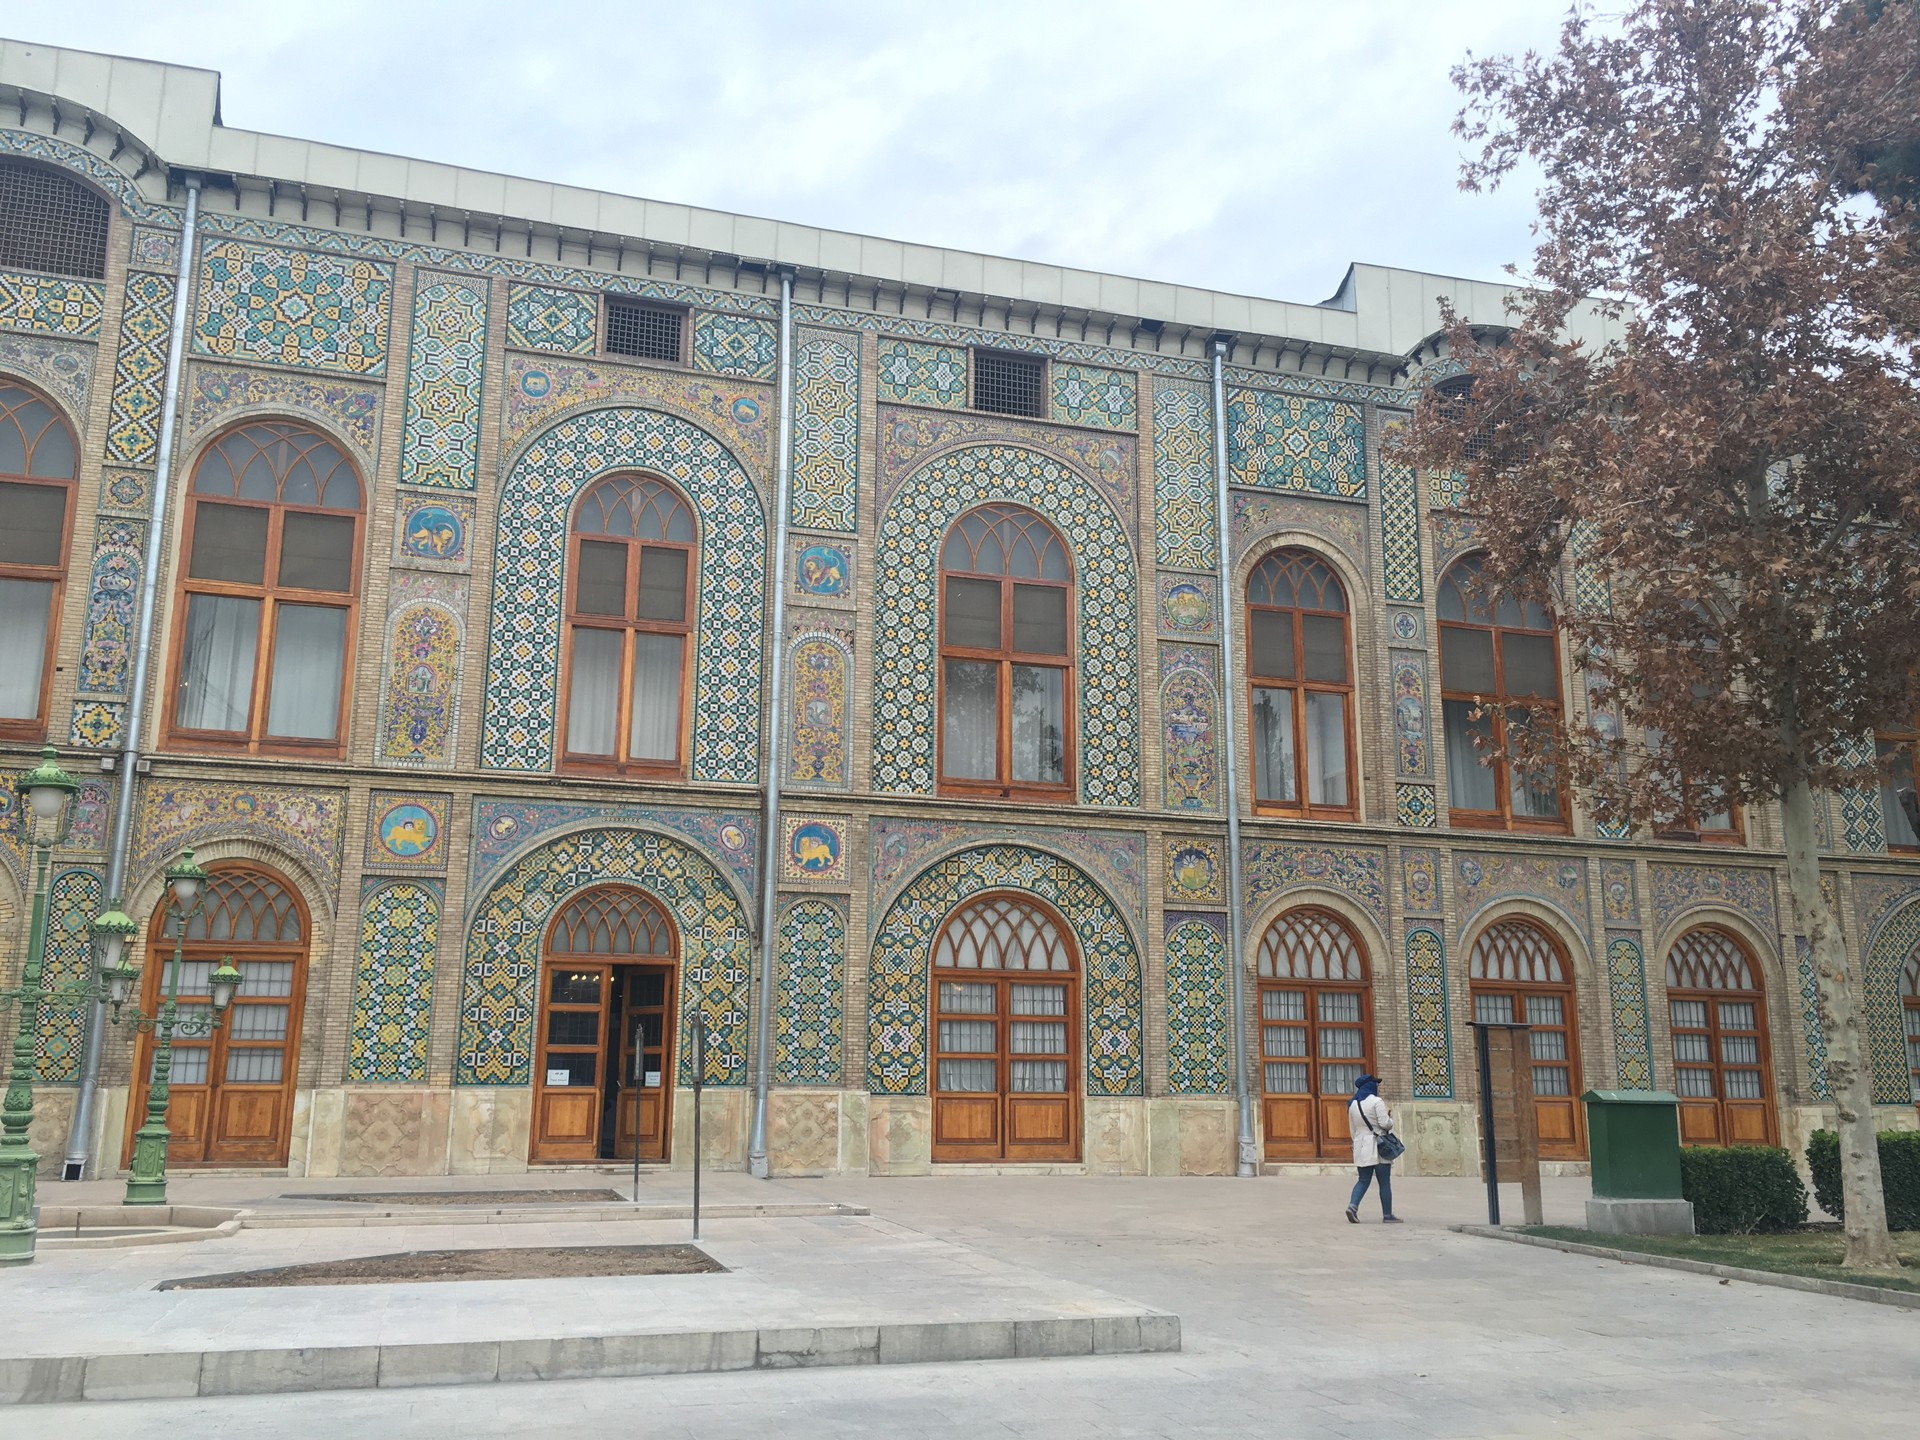 golestan-palace-complex-pt-1-2f5777a674d